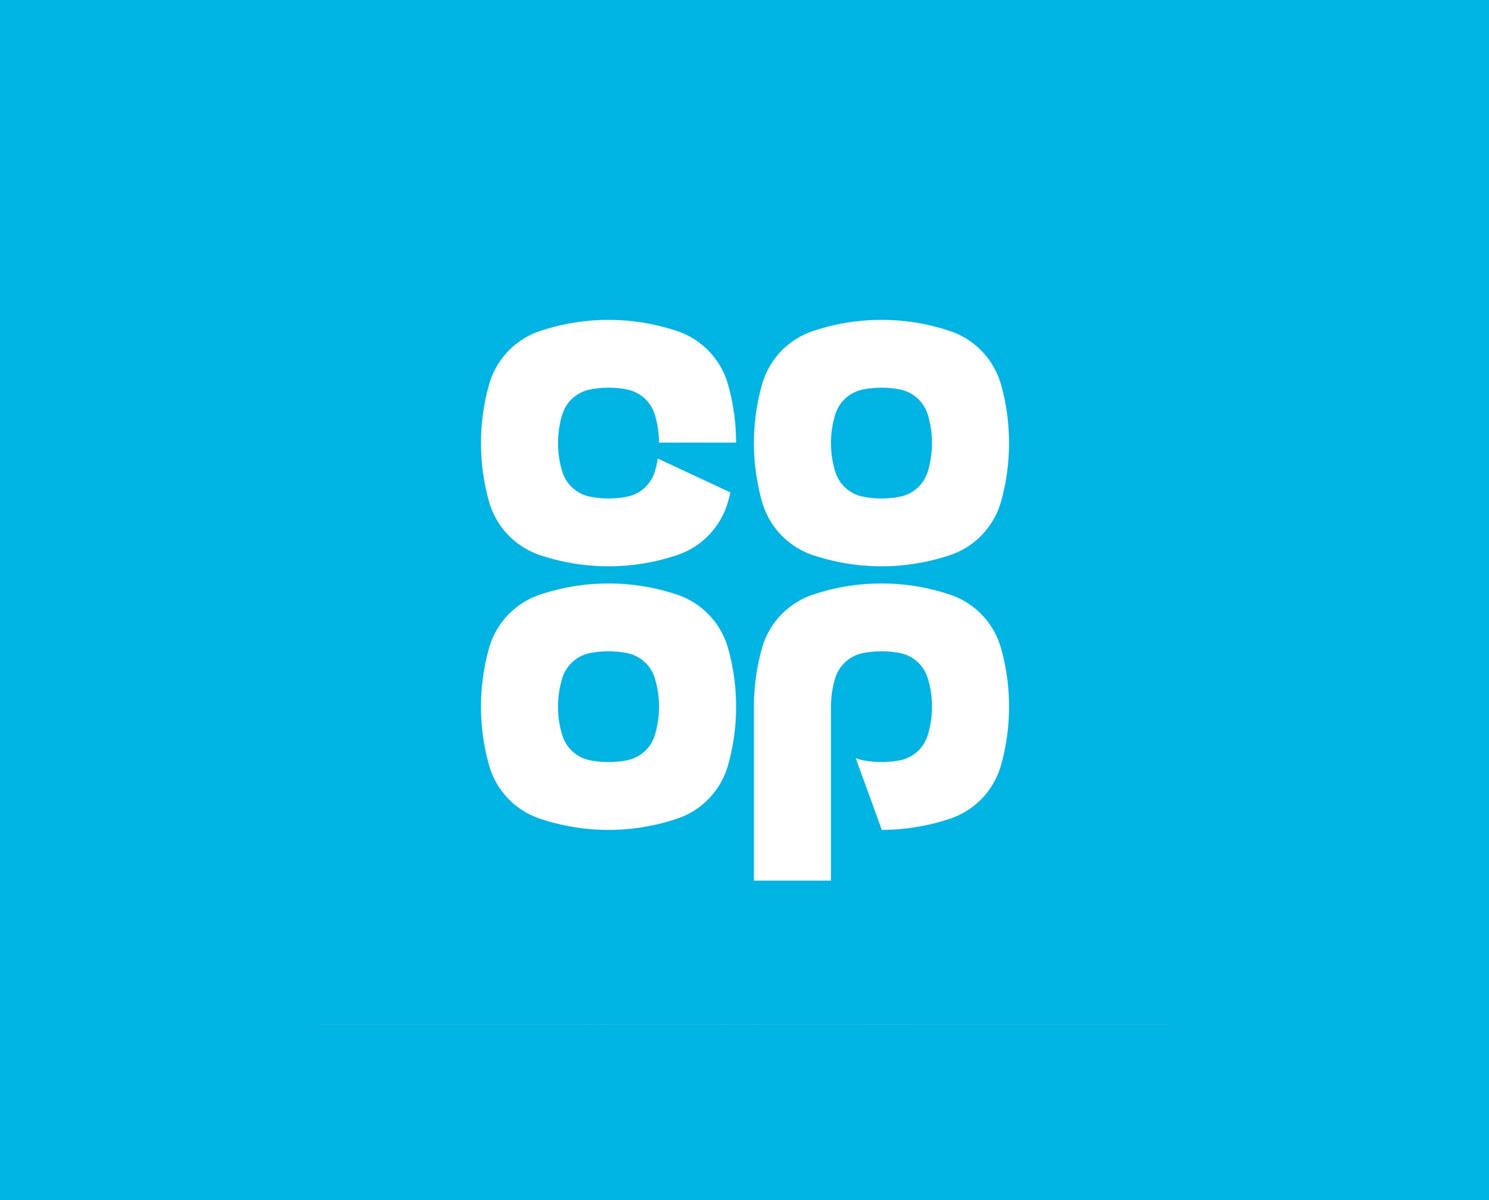 Co Op Brand Refresh Logo